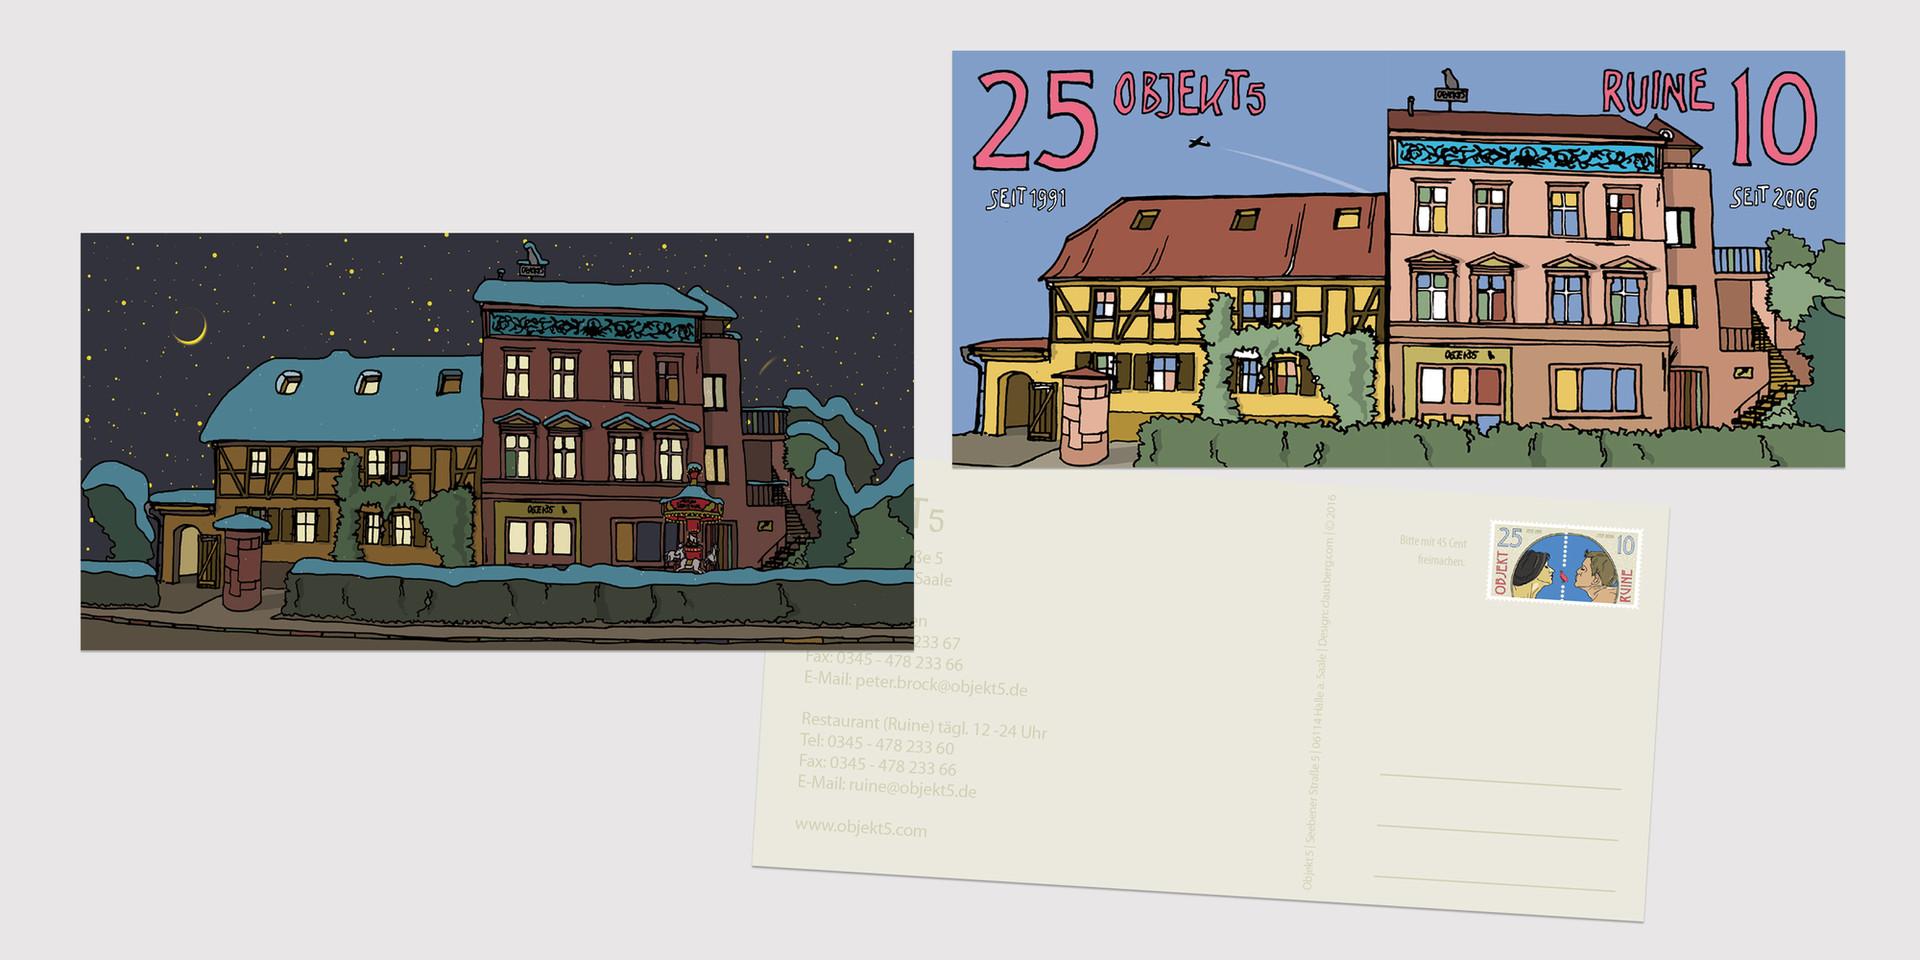 Postkarten Objekt 5